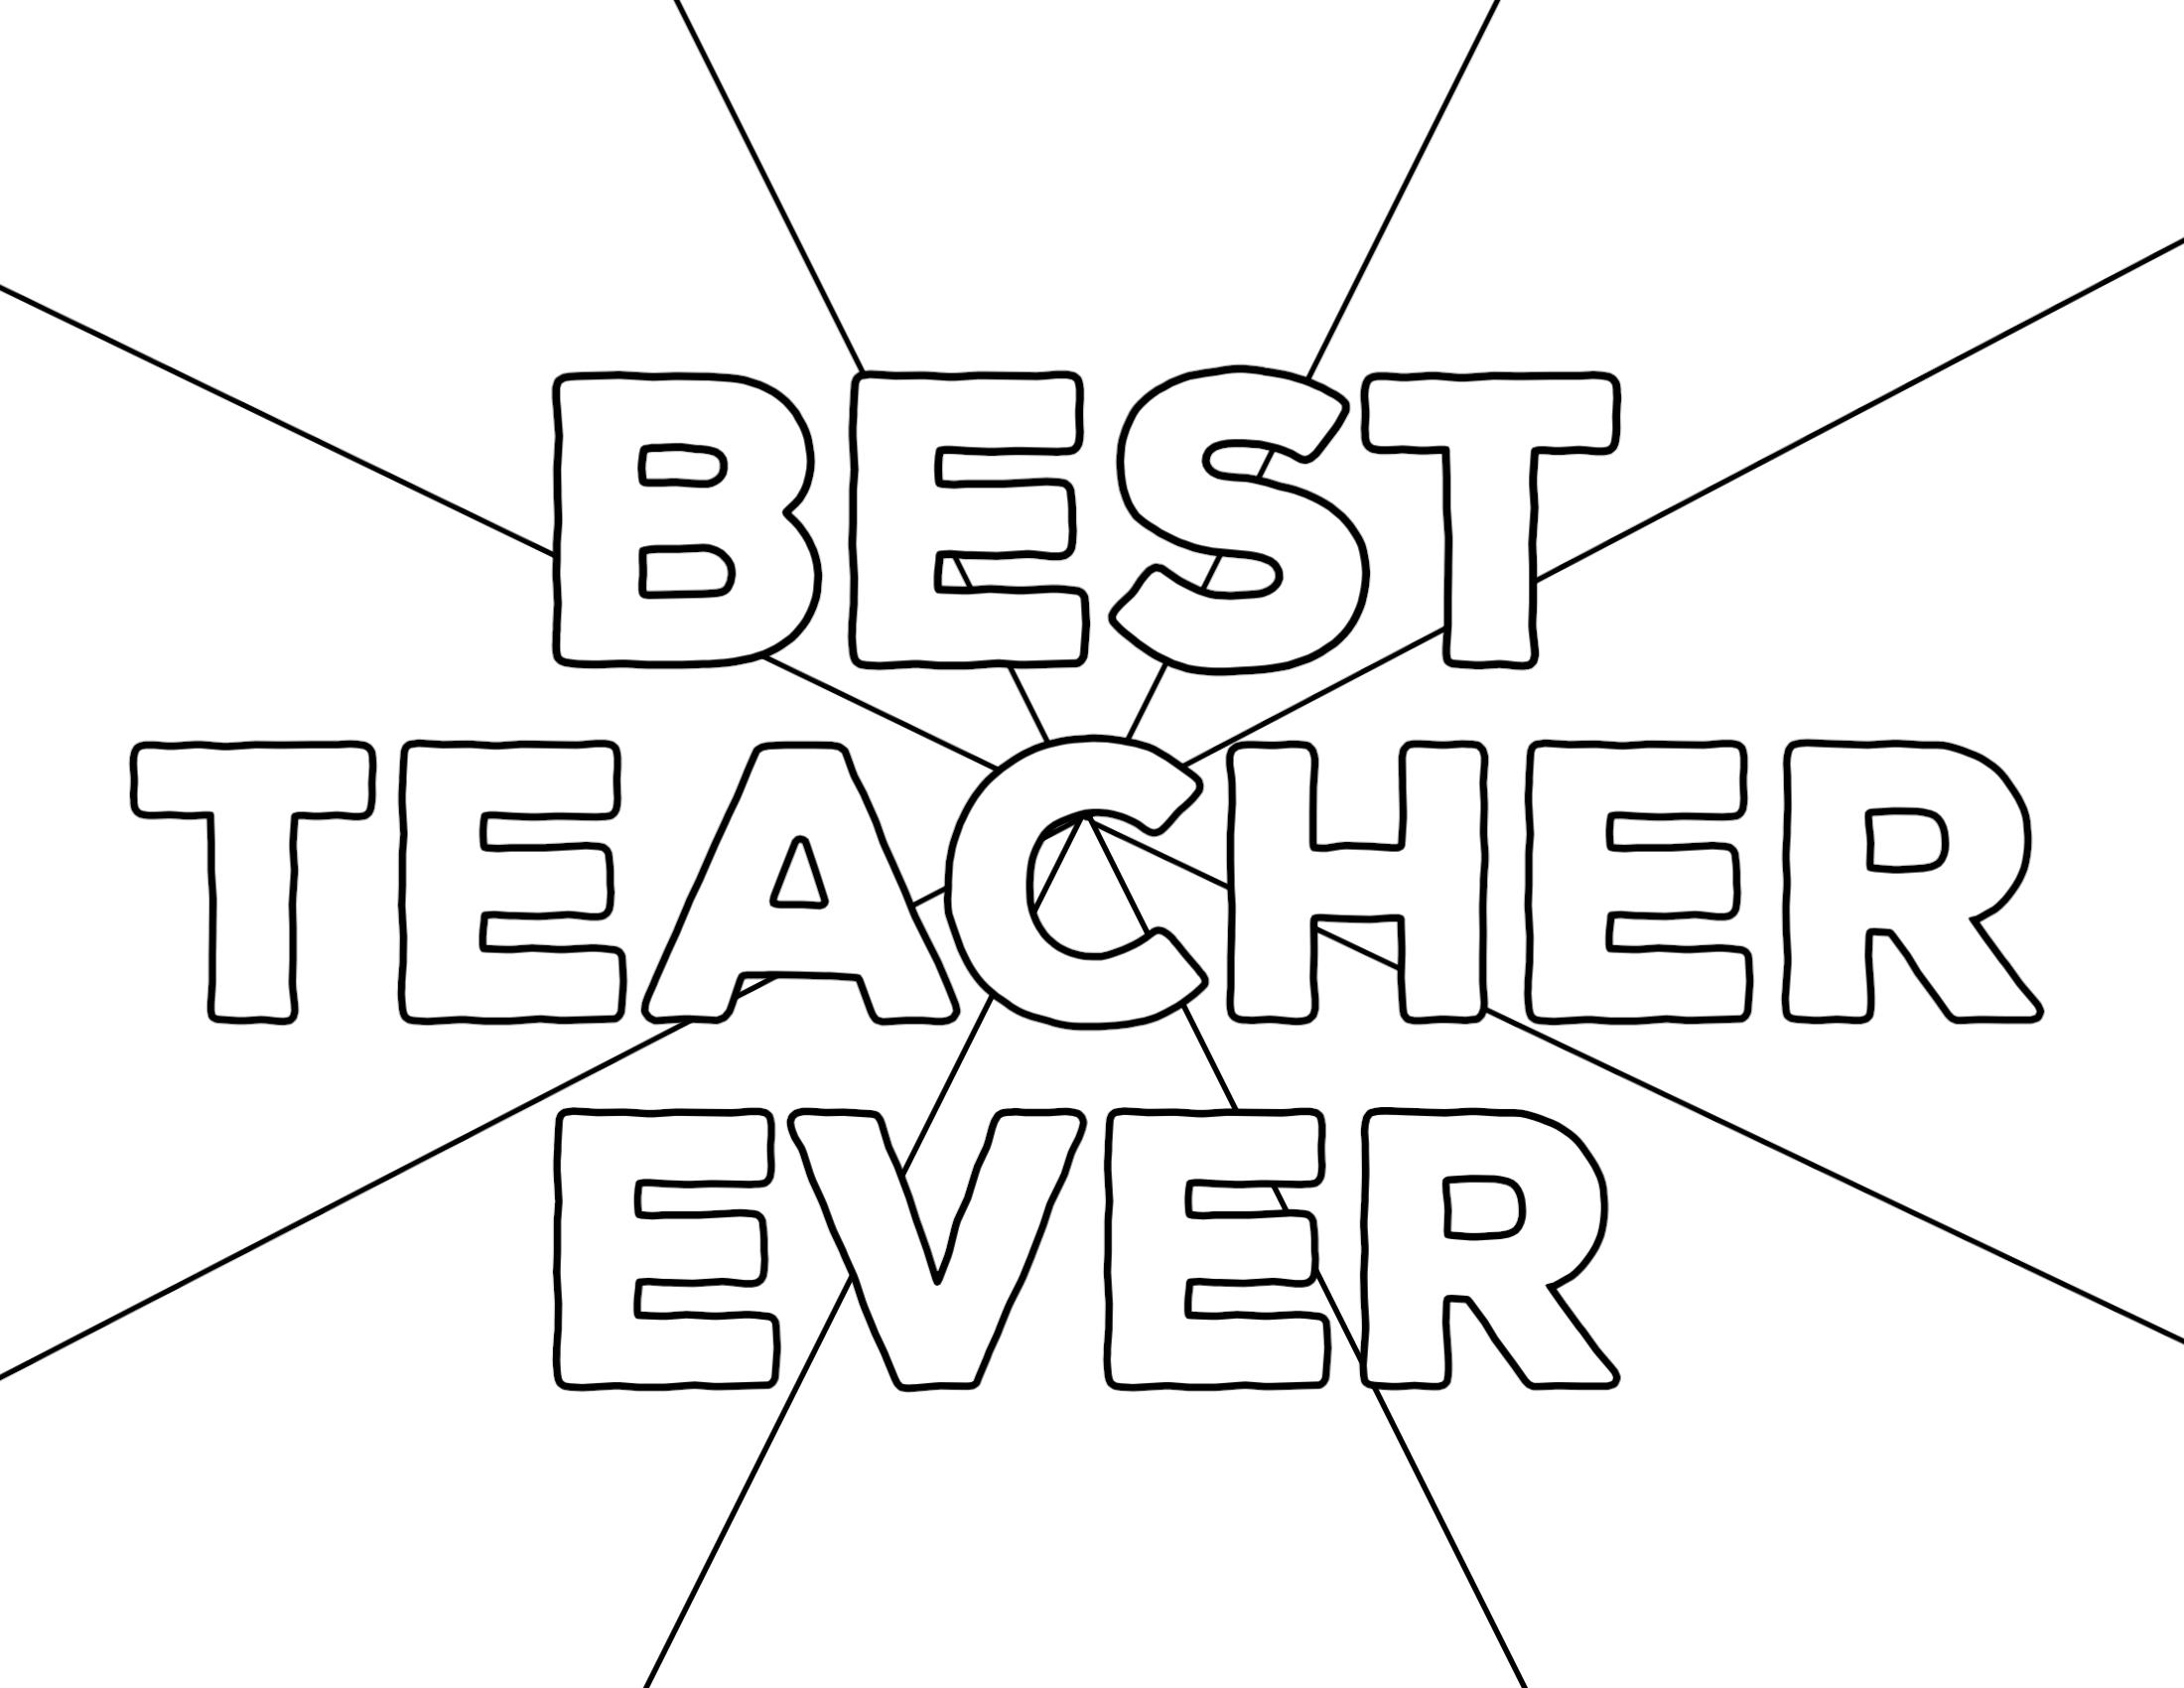 best teacher ever coloring pages | Teacher Appreciation Coloring Pages - Paper Trail Design